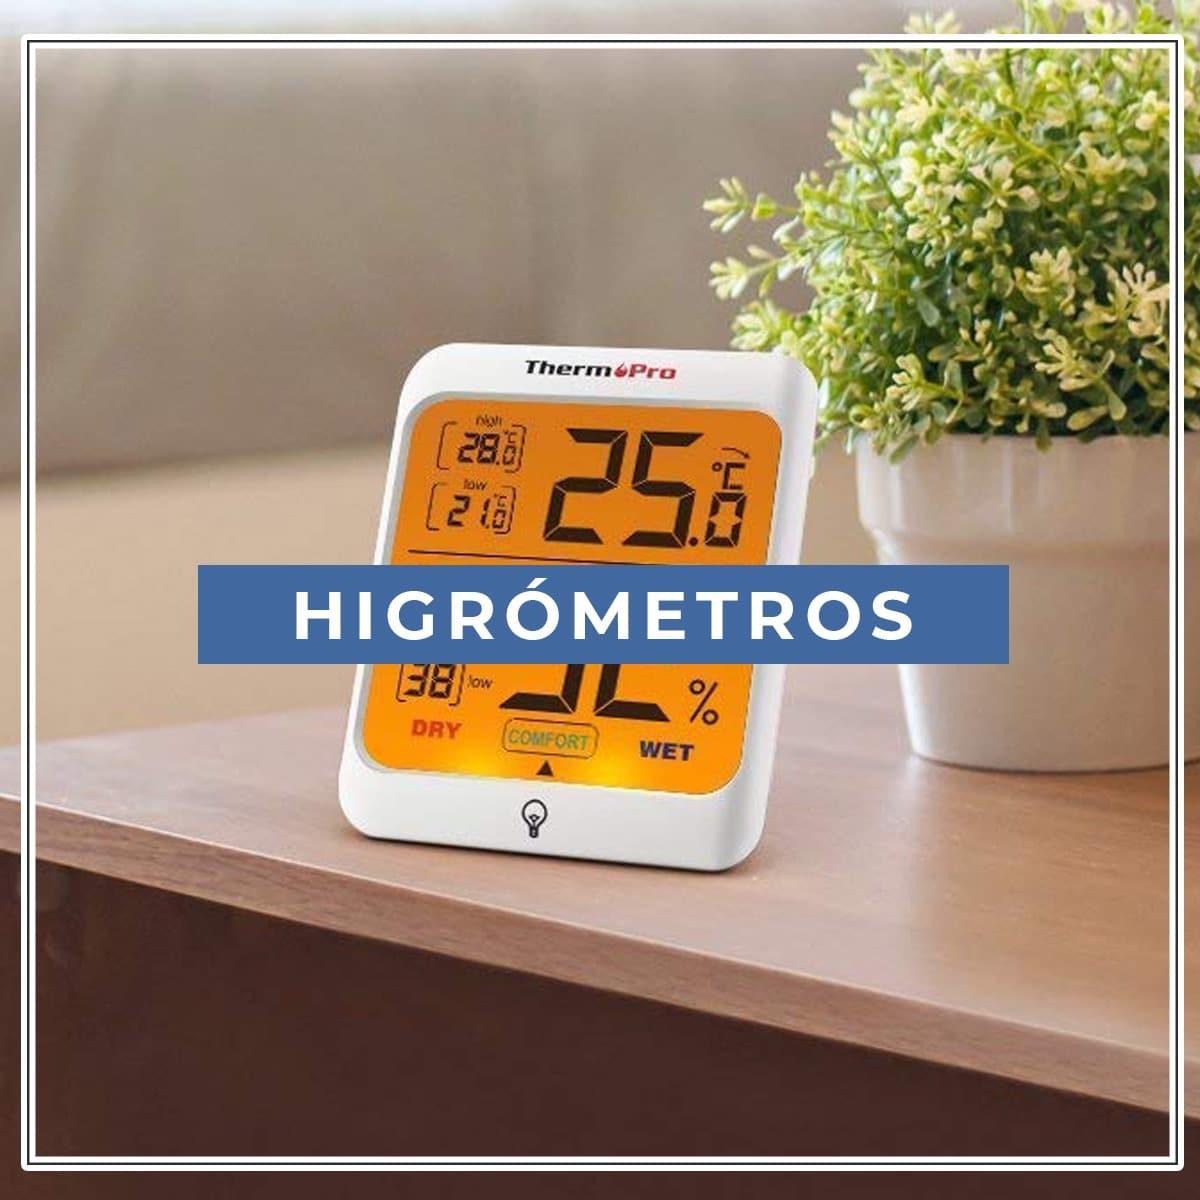 higrometros